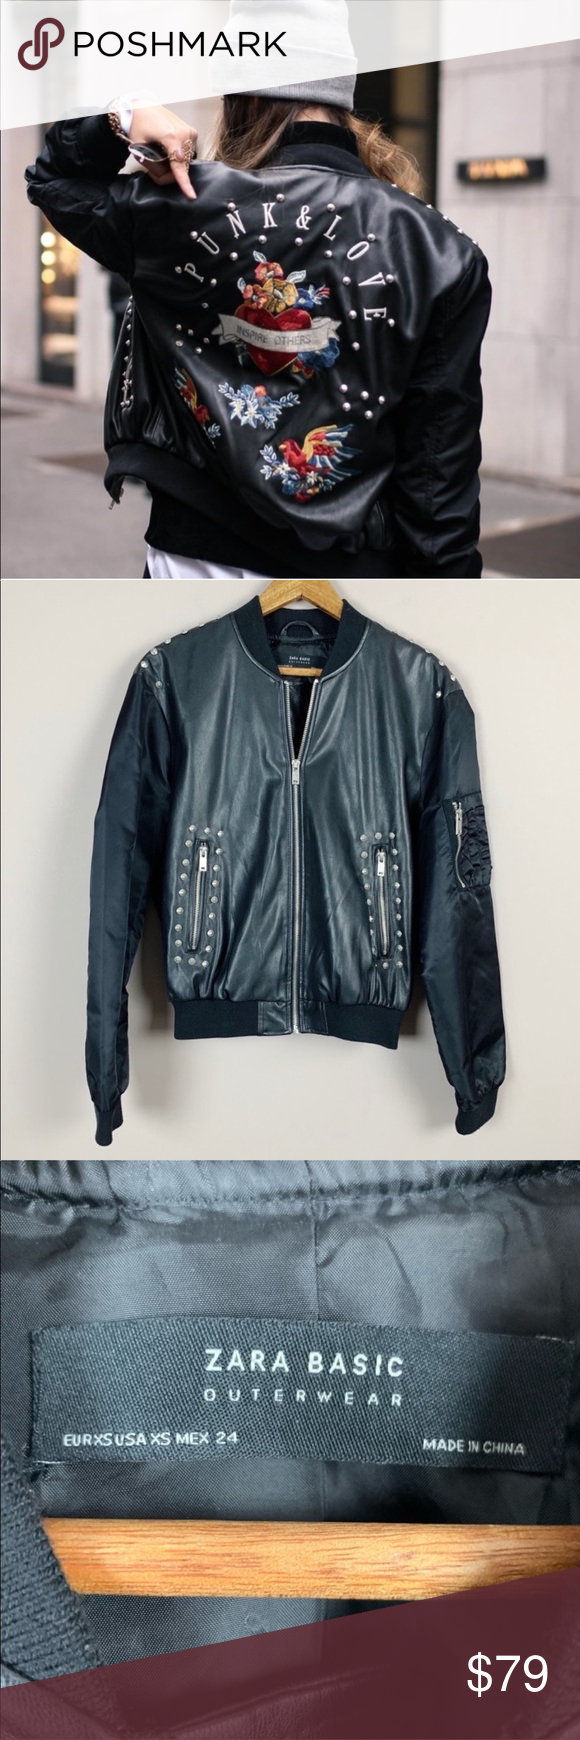 Final Sale Zara Punk Love Bomber Jacket Faux Leather Bomber Jacket Bomber Jacket Clothes Design [ 1740 x 580 Pixel ]